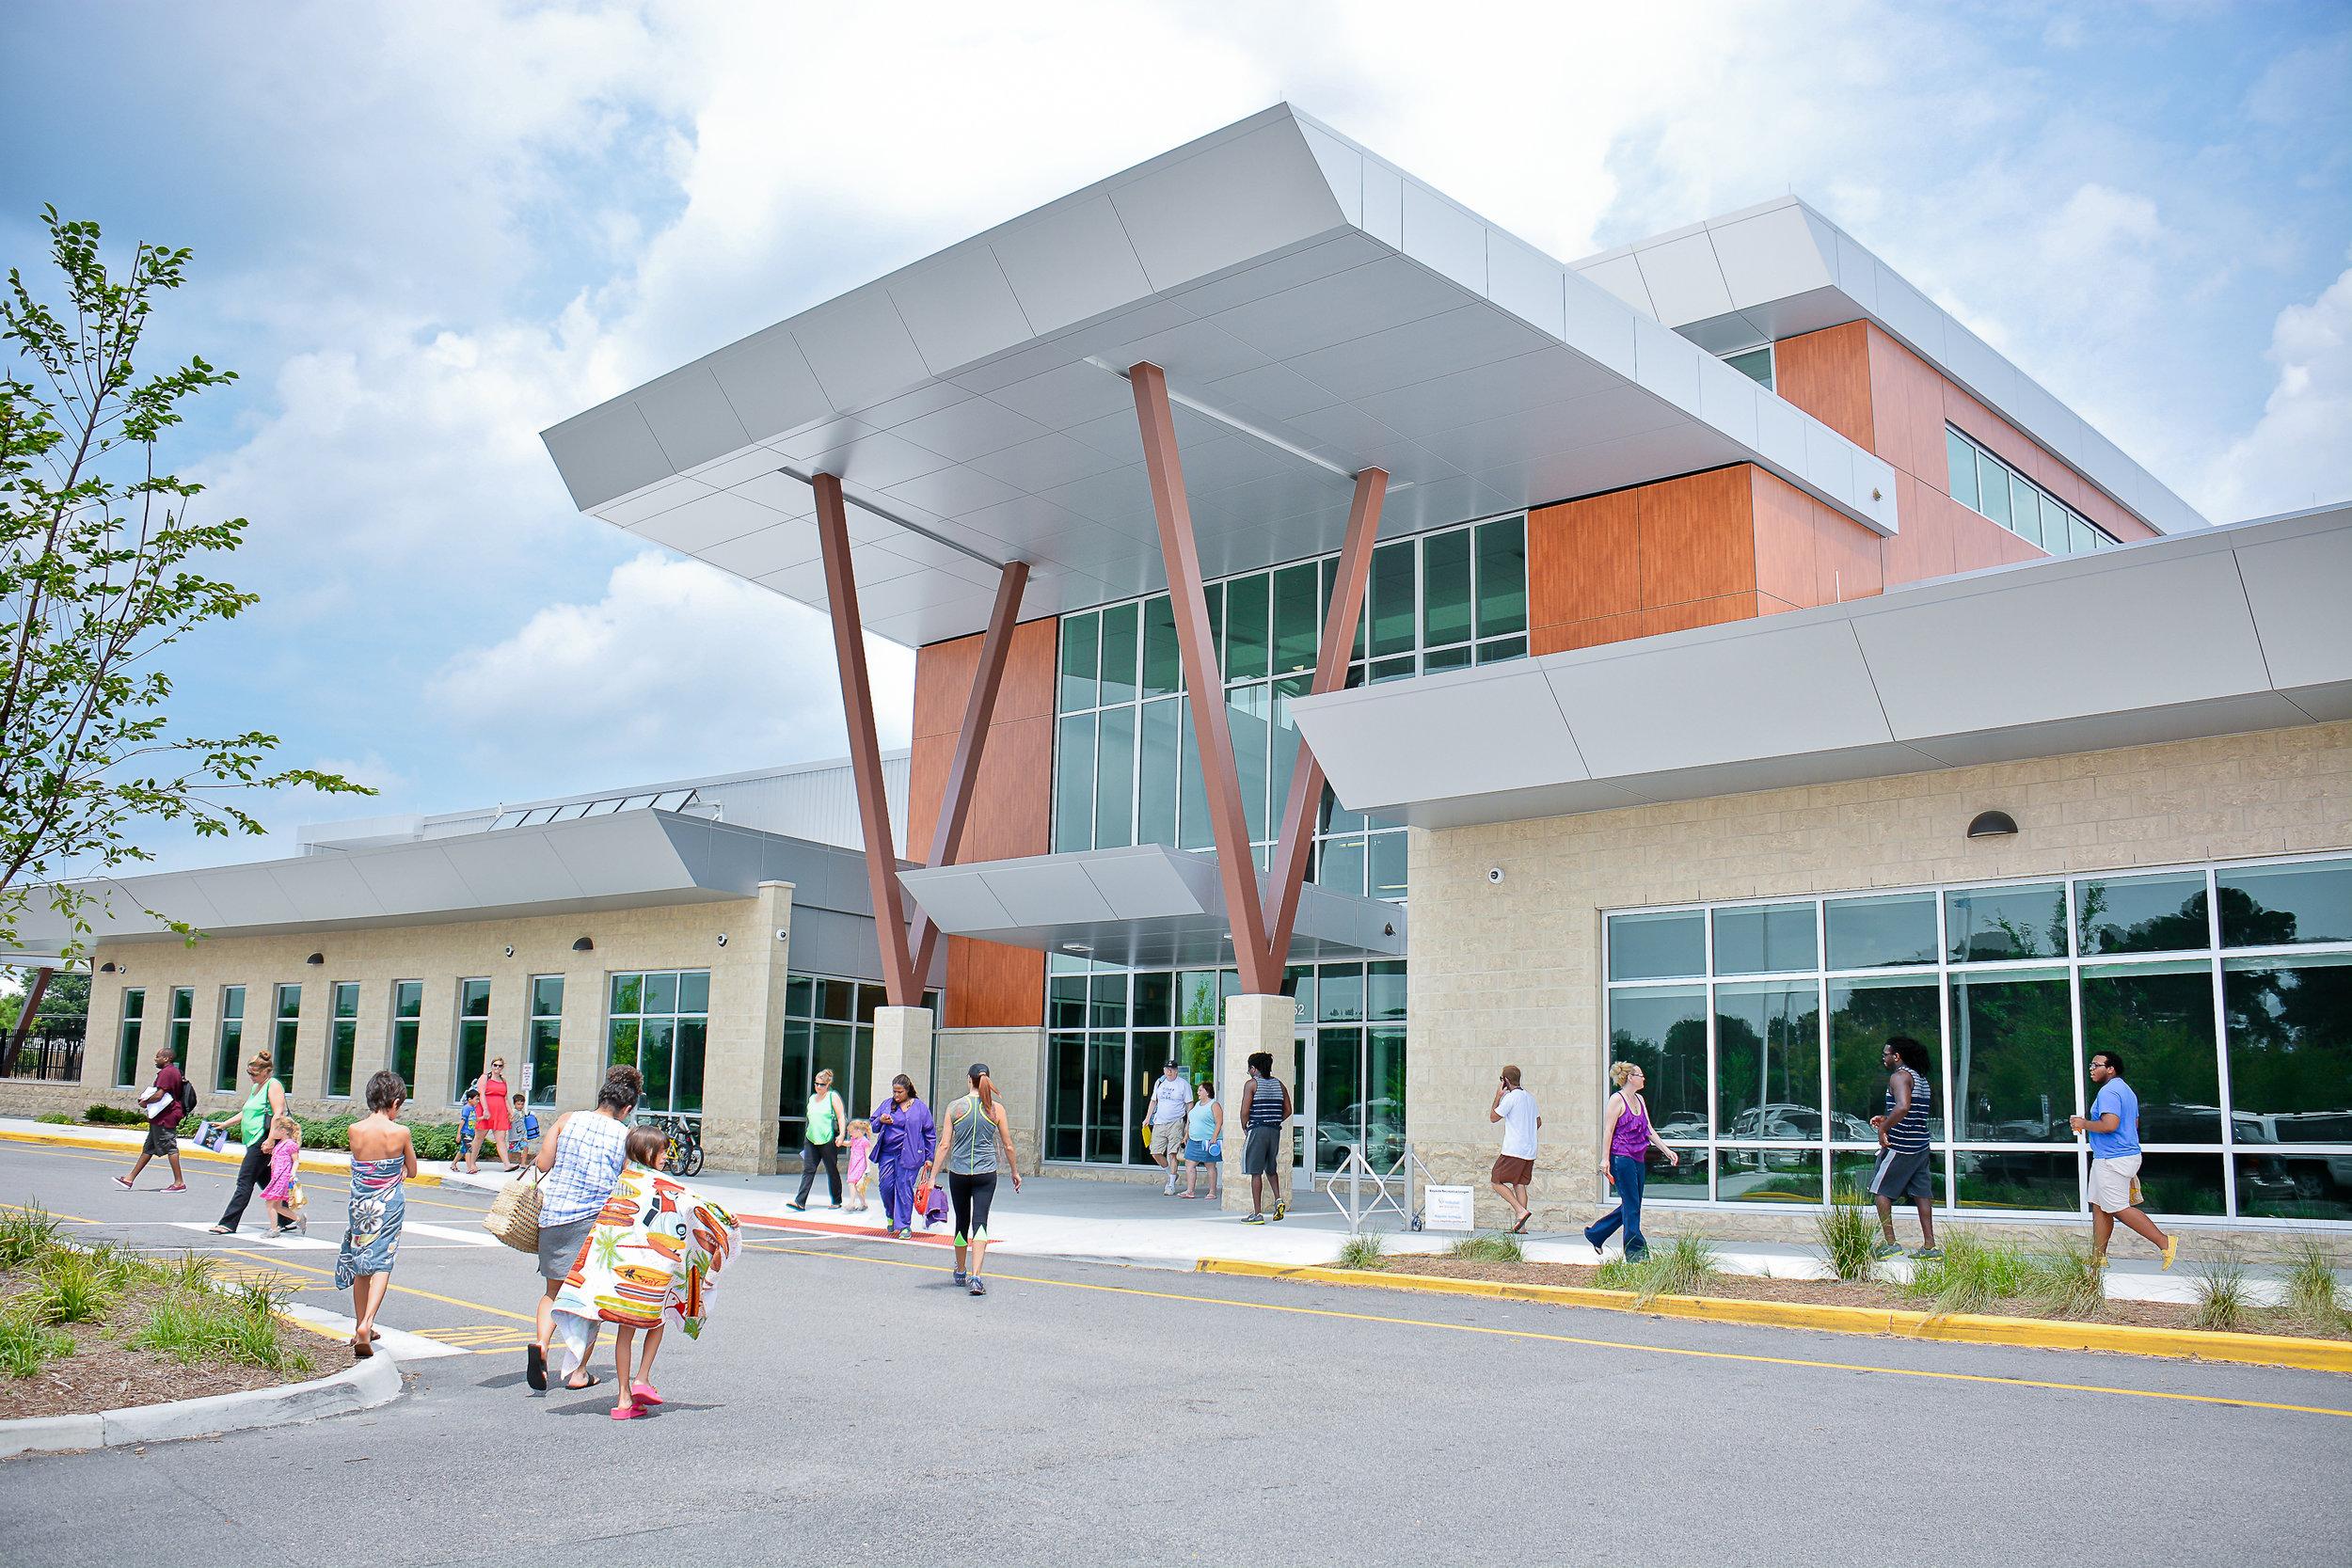 Williams Farm Community Recreation Center Virginia Beach, VA Completed 2012